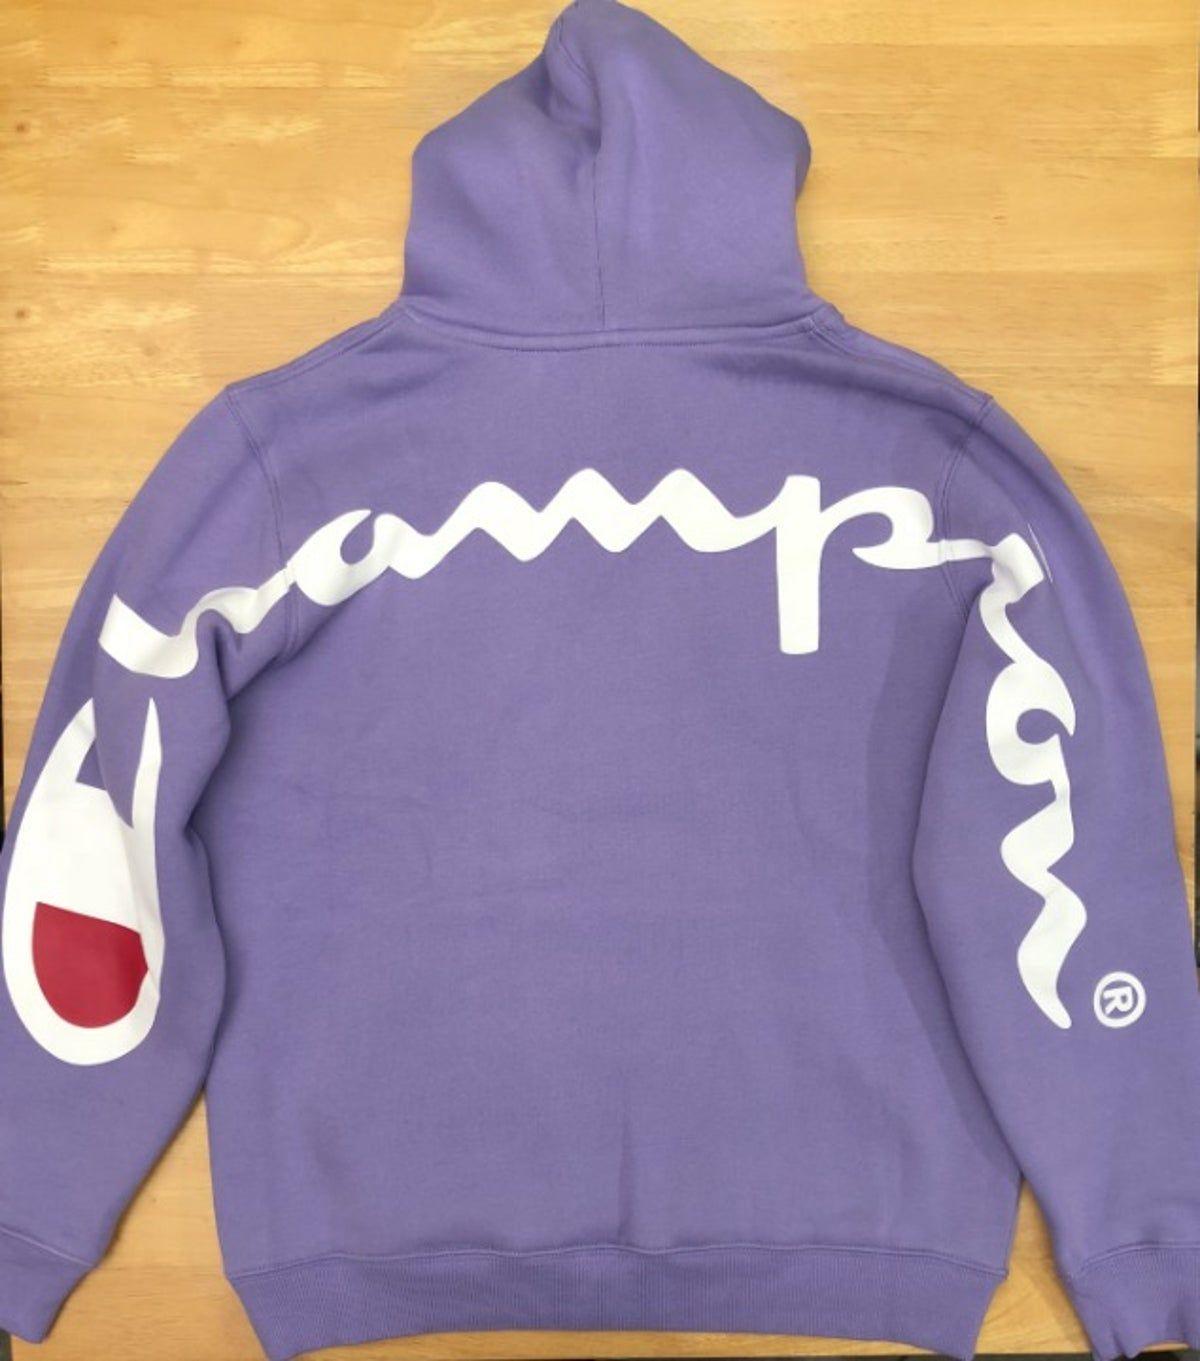 Supreme X Champion Ss18 Purple Hoodie L Purple Hoodie Hoodies Champion Hoodie [ 1361 x 1200 Pixel ]